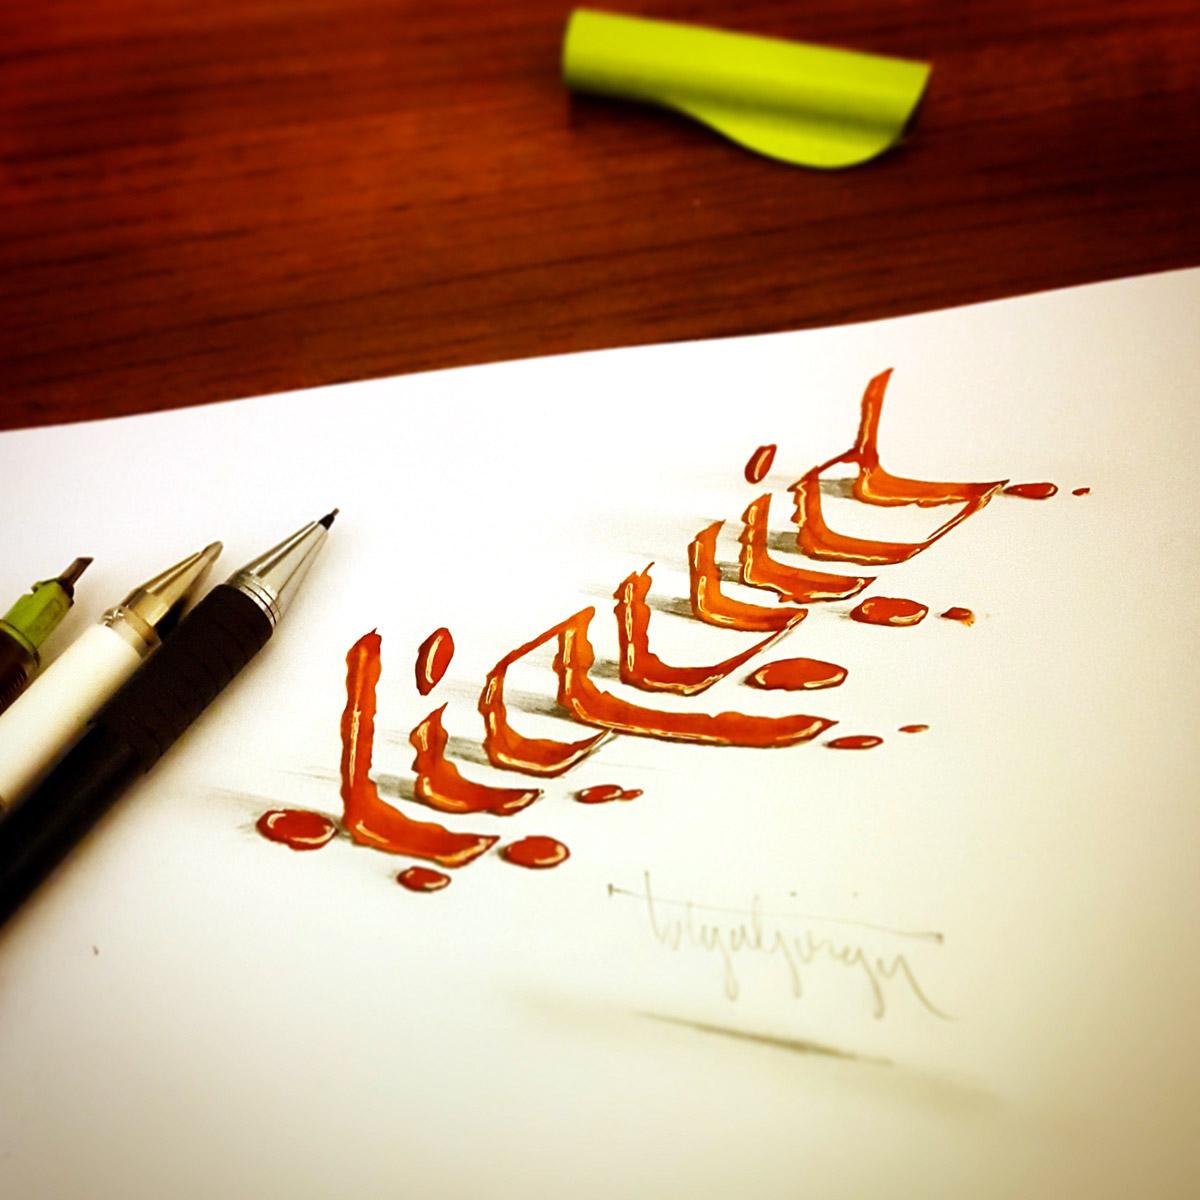 9-liquid-3d-calligraphy-by-tolga-girgin